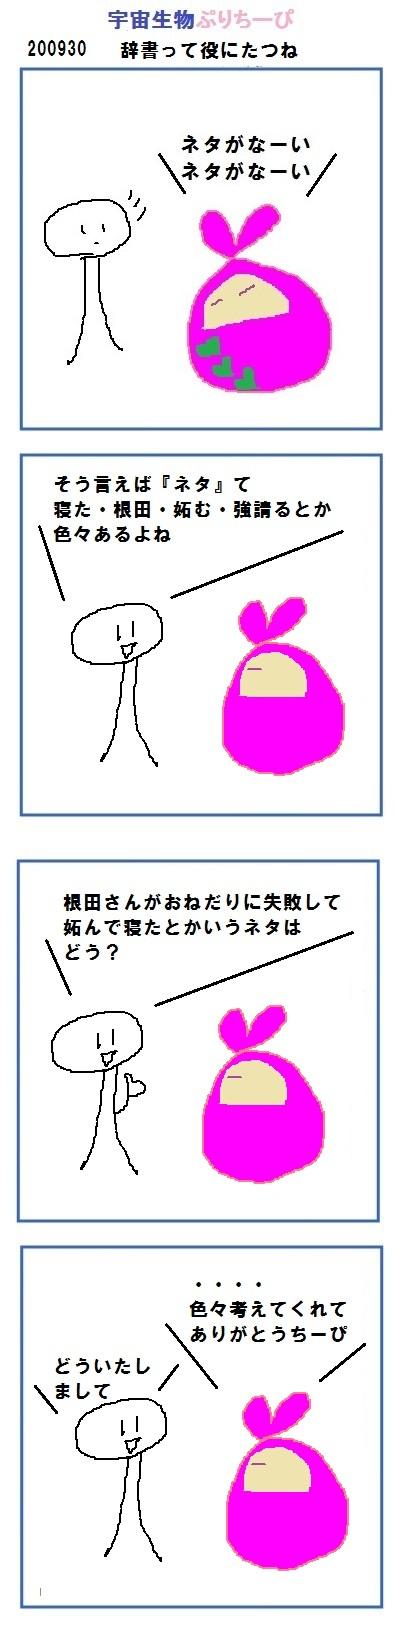 200930-pry.jpg